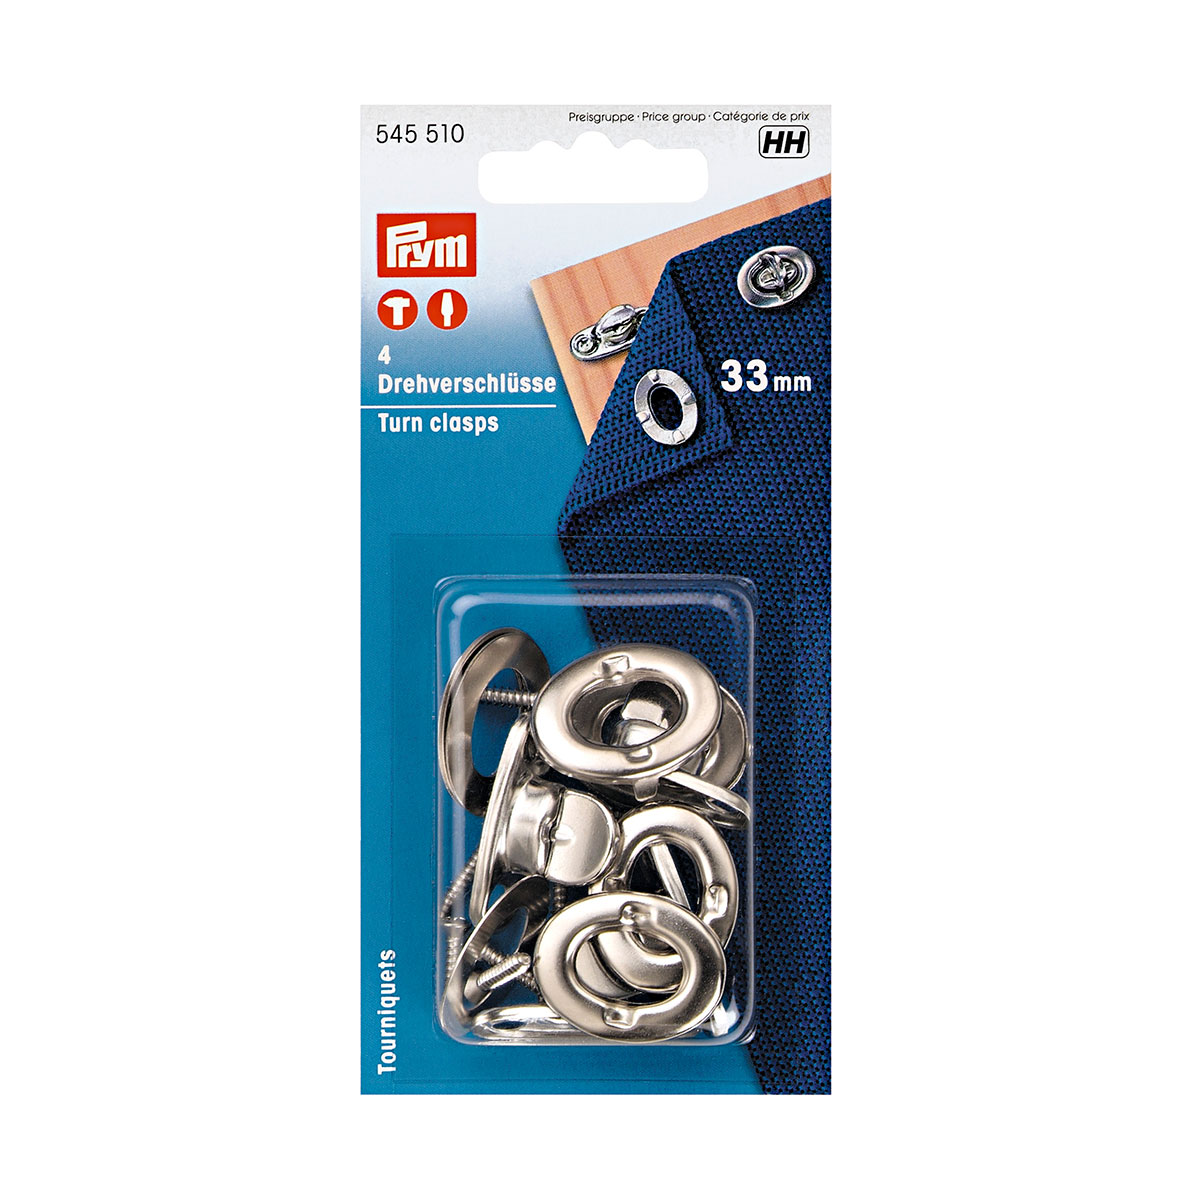 545510 Поворачивающиеся замки (латунь), серебристый, 33 мм, упак./4 шт., Prym